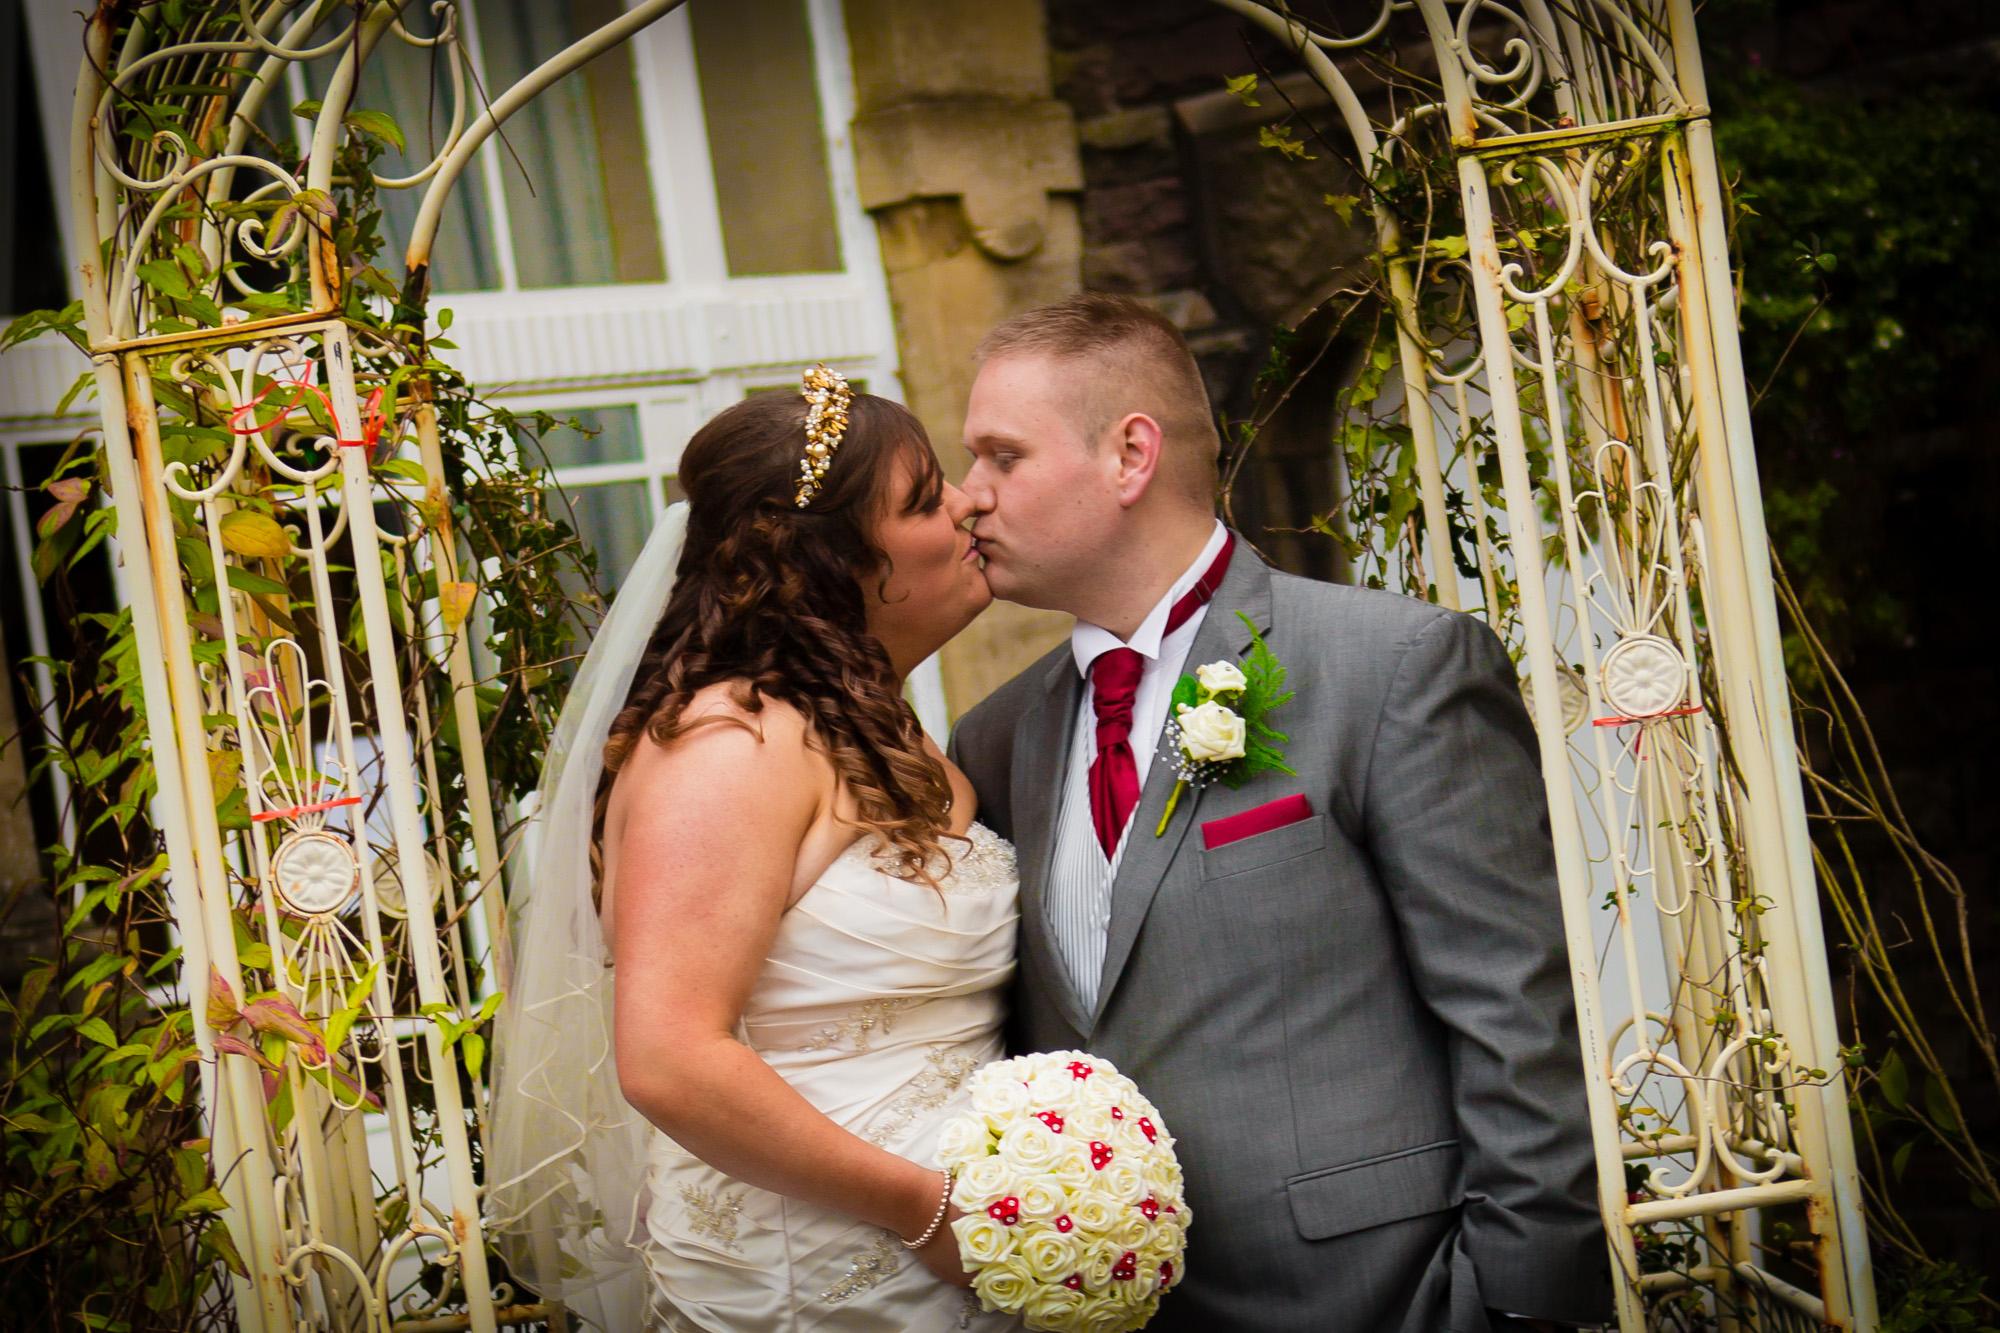 South Wales Wedding Photograher at Craig Y Nos Castle (36)